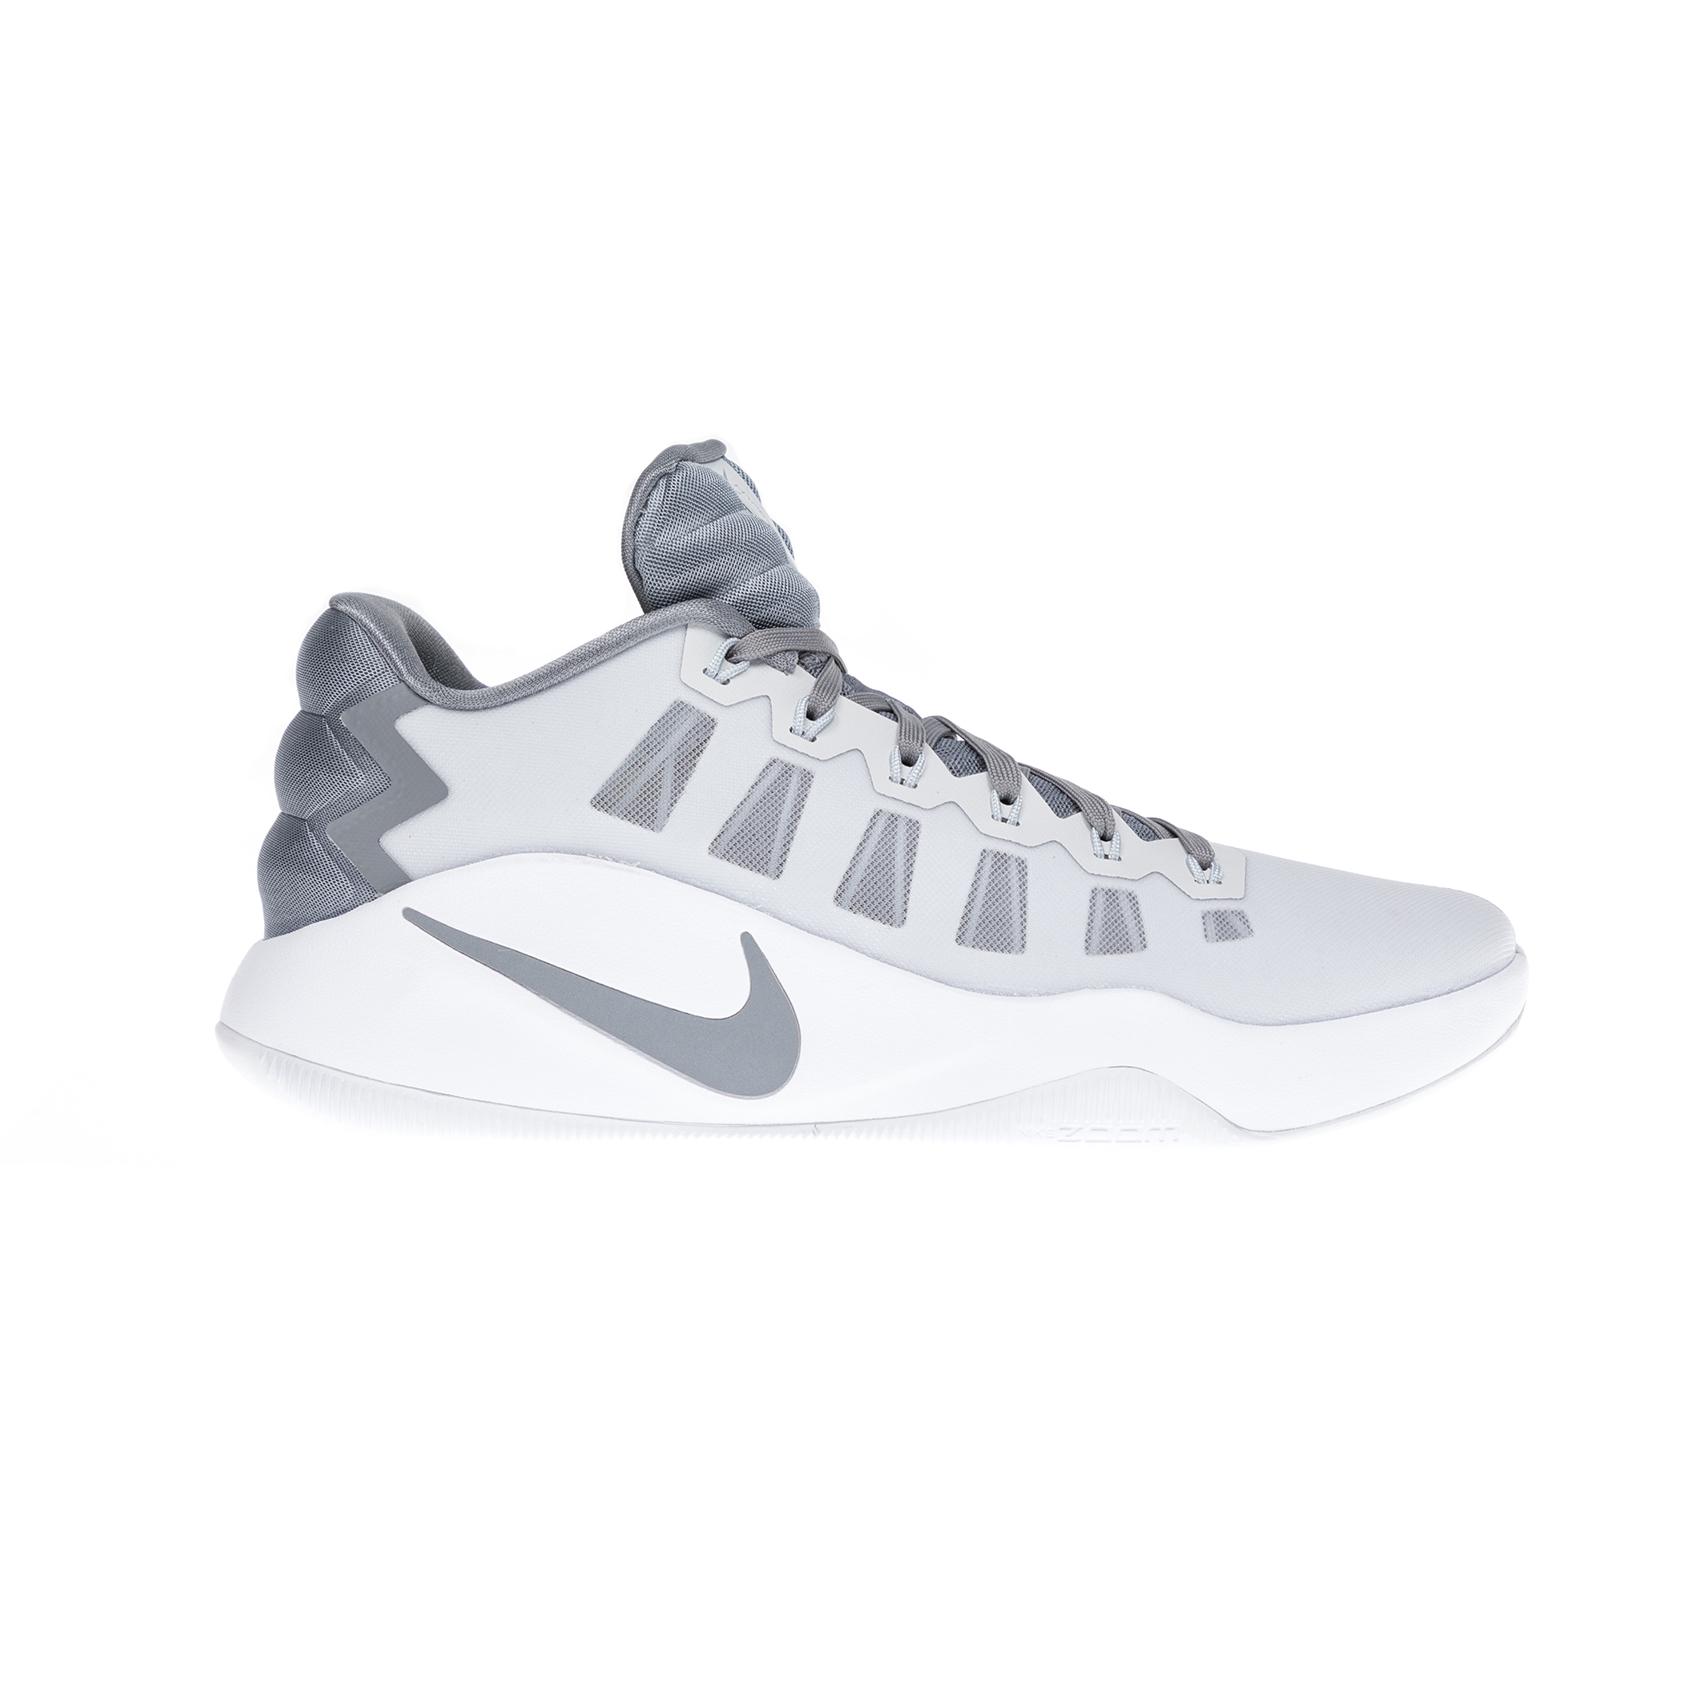 NIKE – Ανδρικά παπούτσια NIKE HYPERDUNK 2016 LOW άσπρα